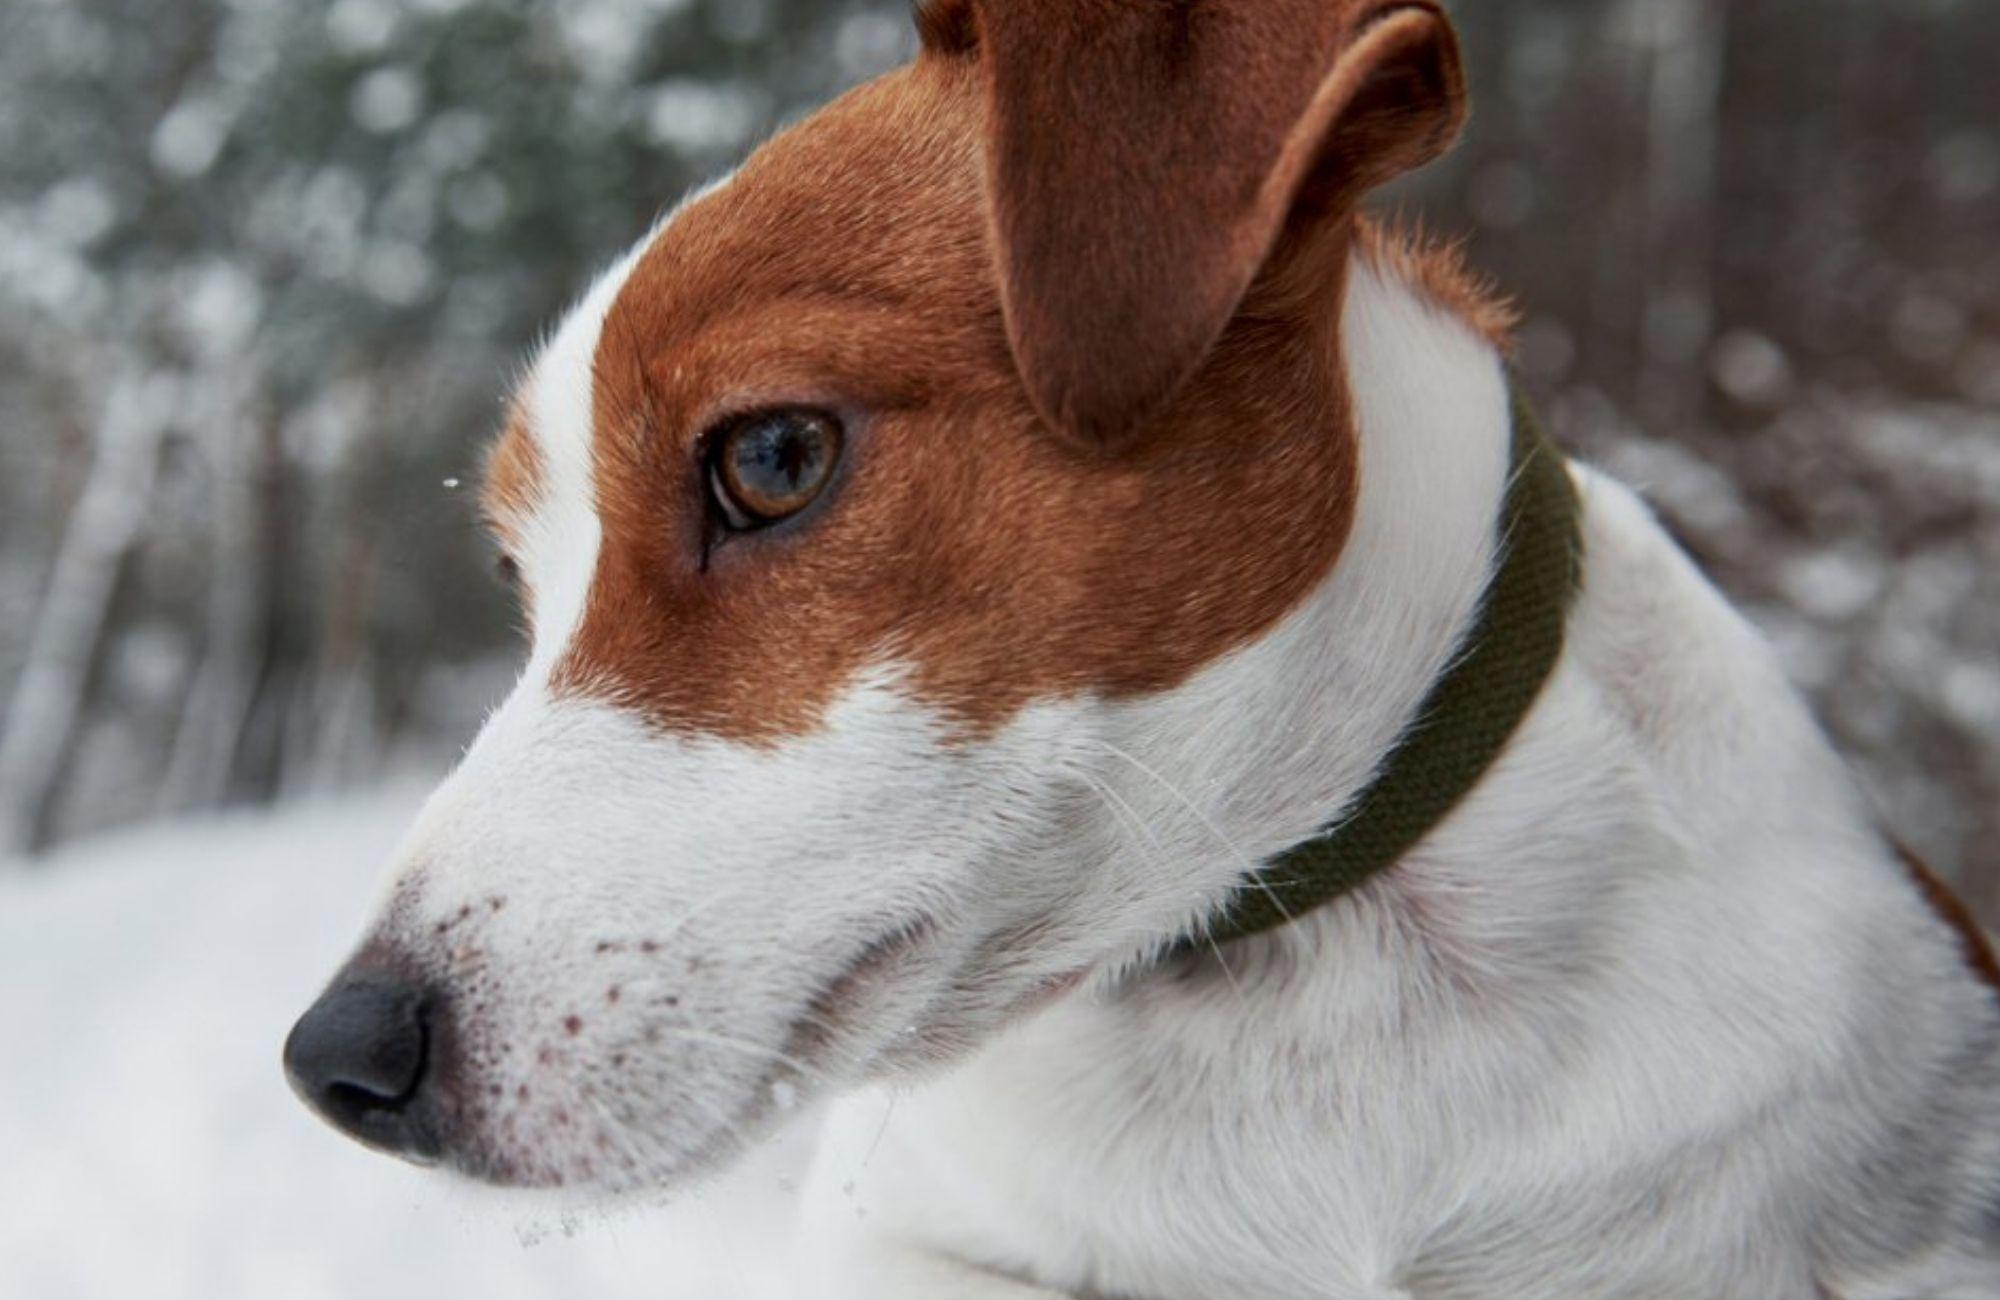 La vista dei Cani OK - Curiosità su Animali - Giargini Mangimi